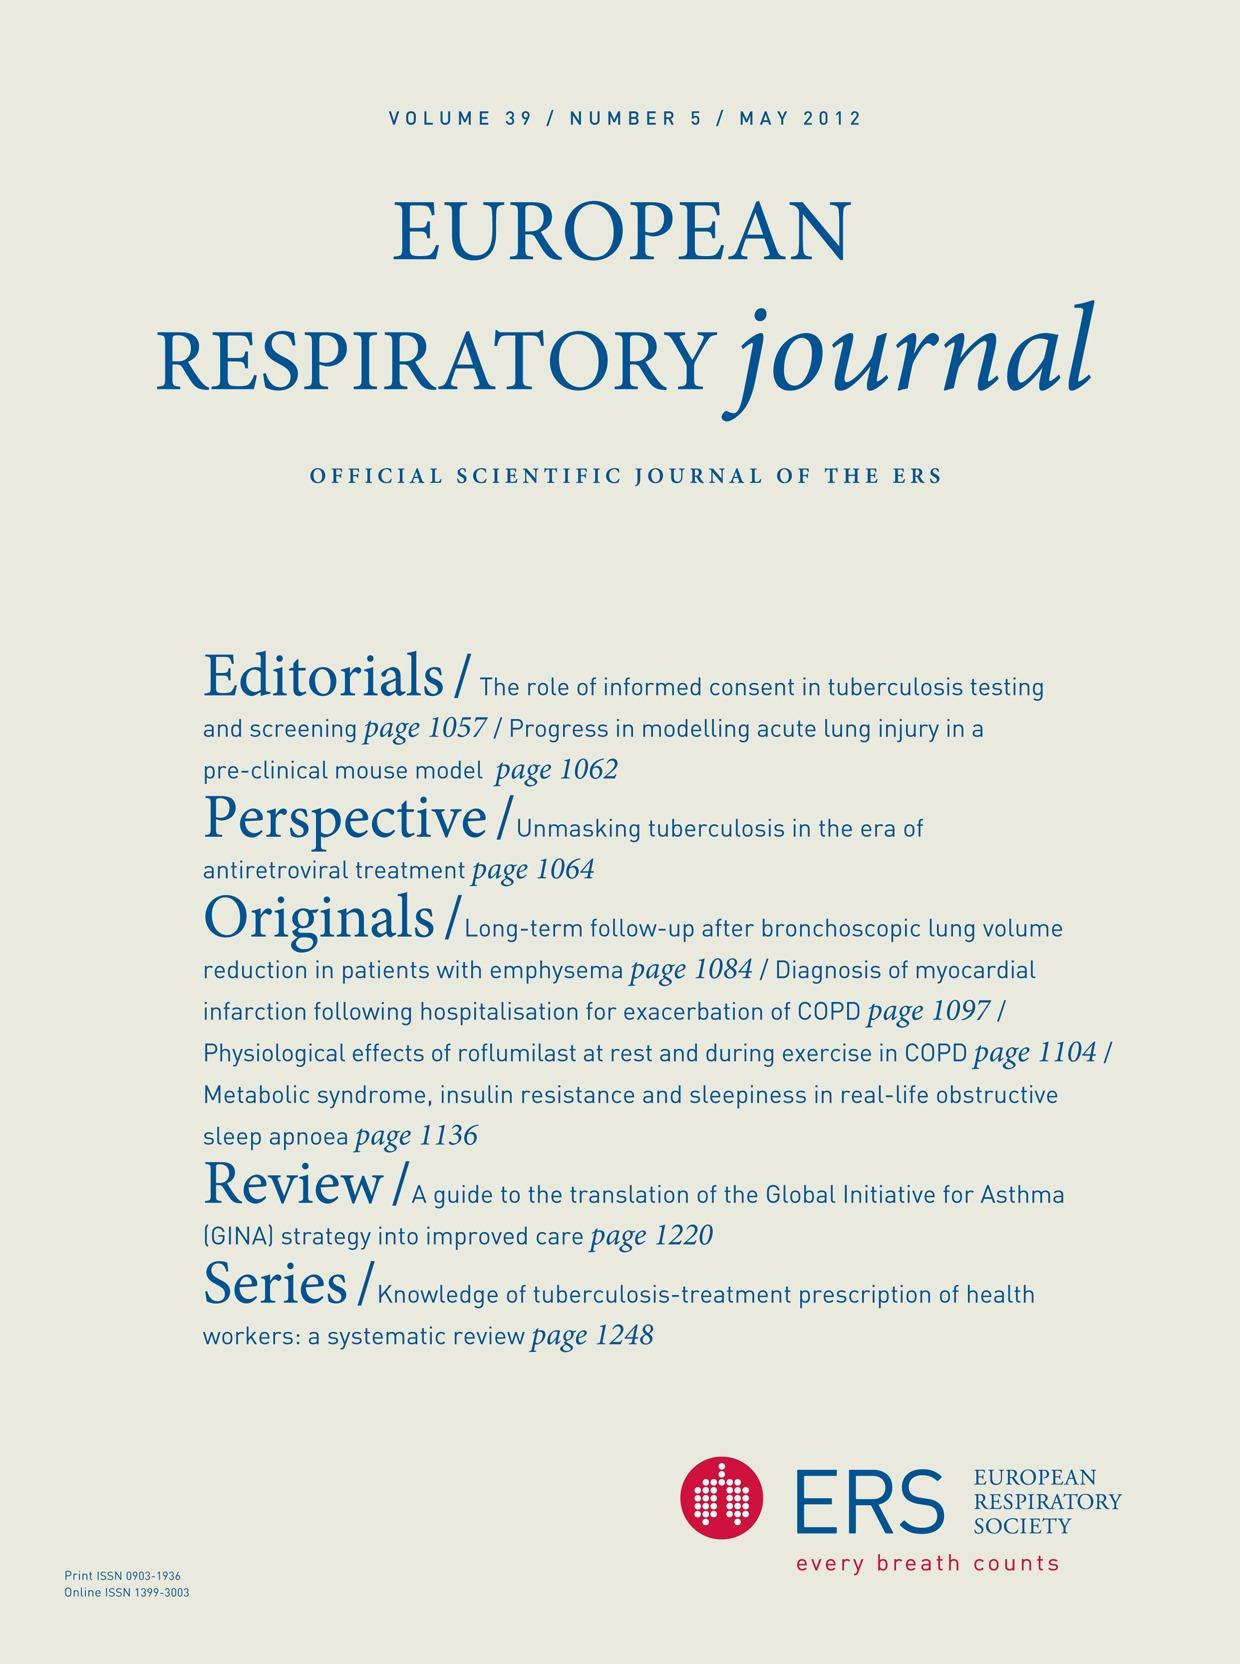 Efficacy of nebulised liposomal amphotericin B in the attack